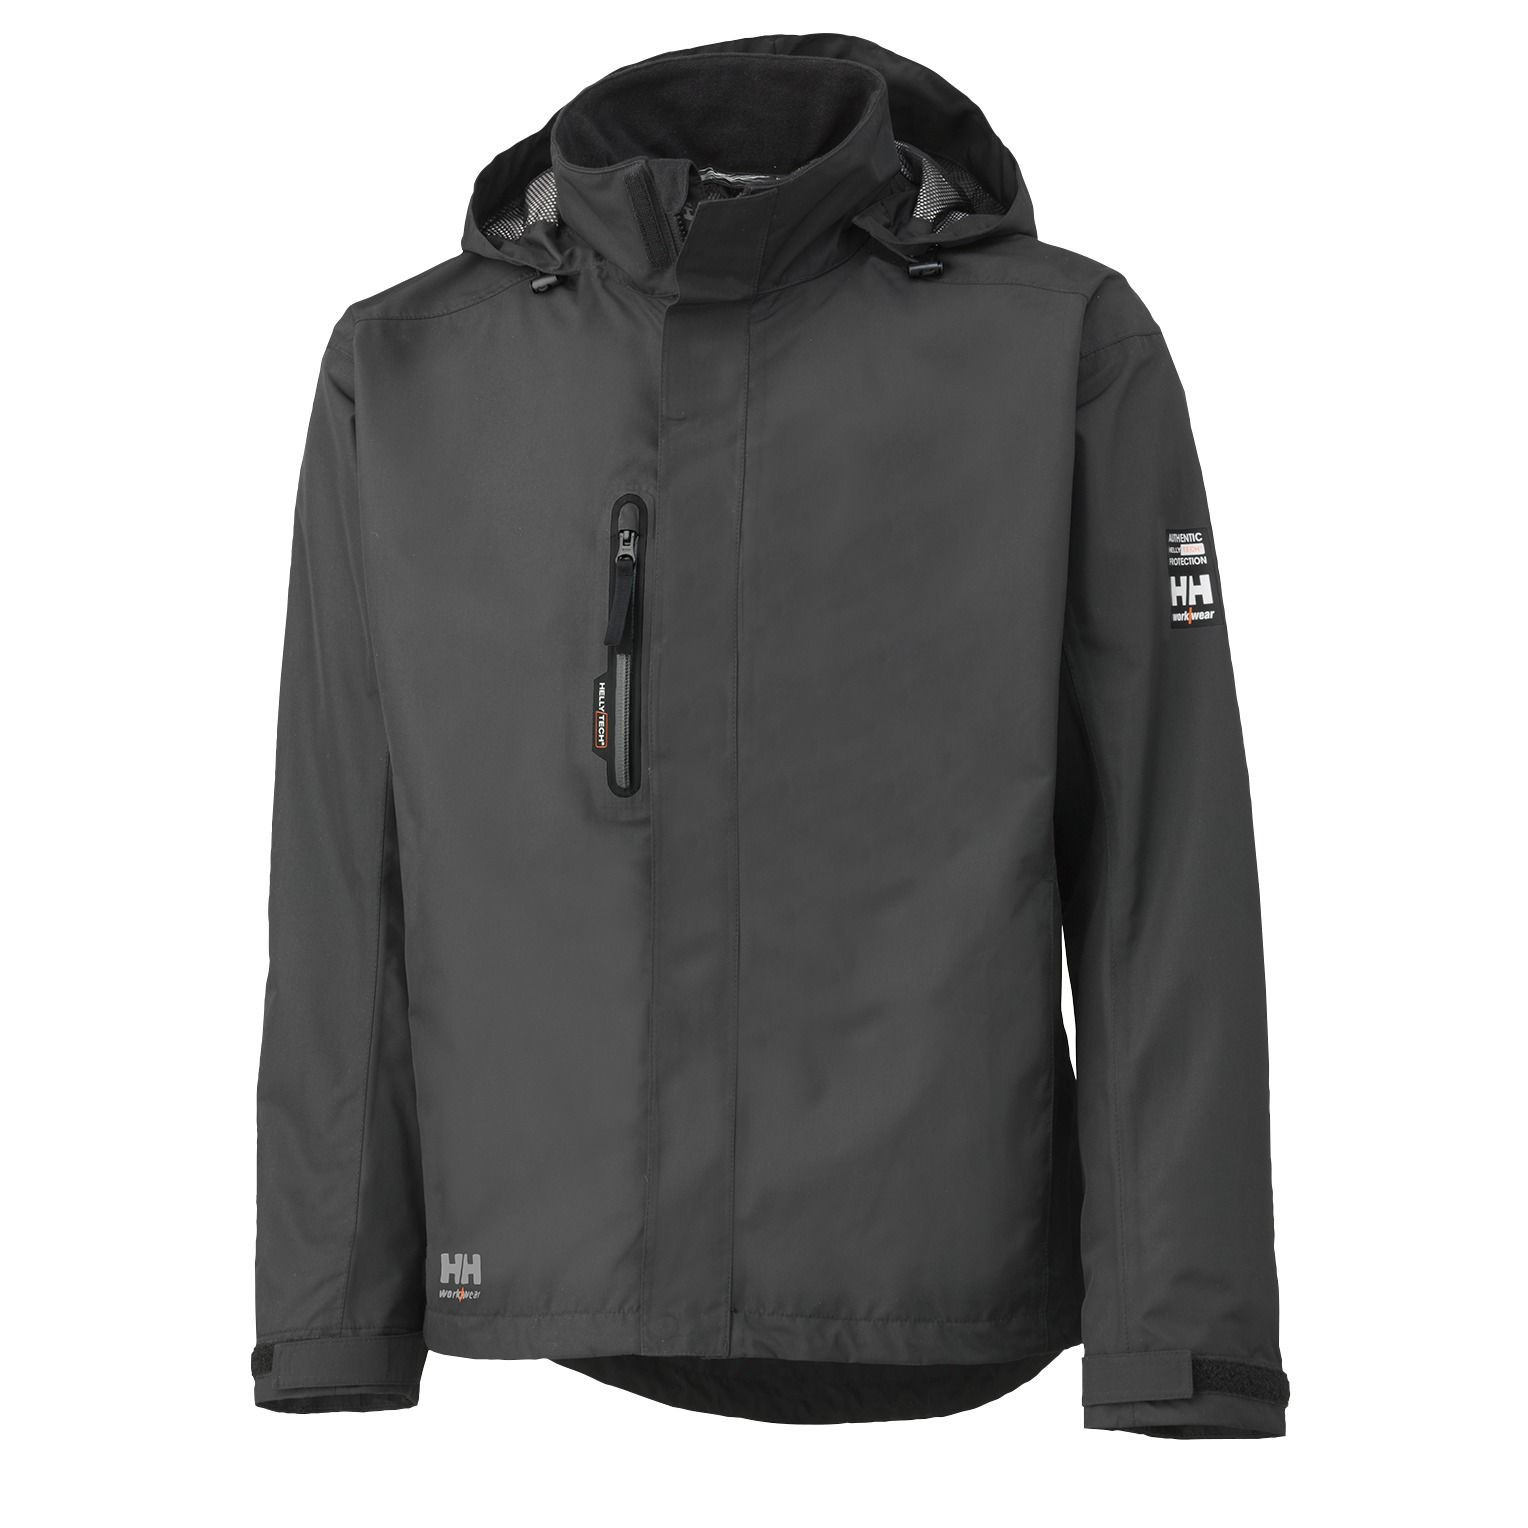 Куртка Helly Hansen Haag Jacket - 71043 (Dark Grey; M)